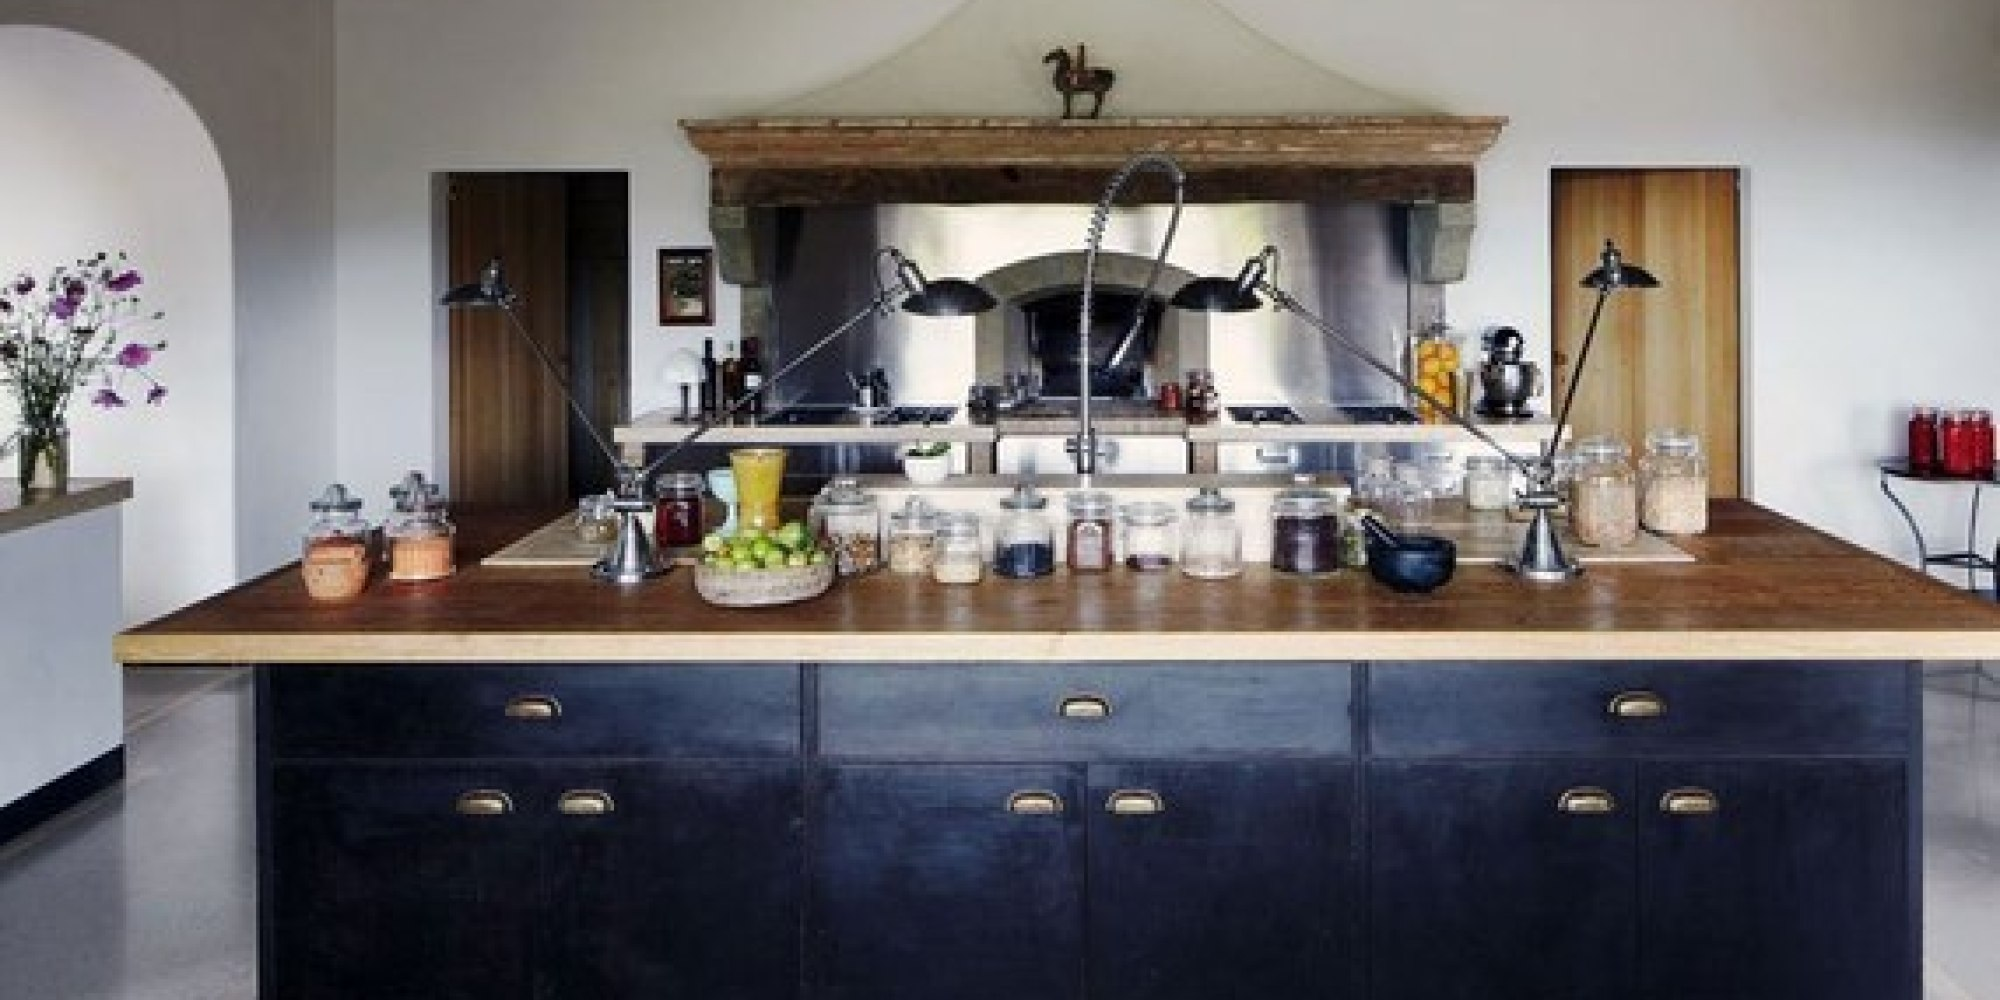 10 Absolutely Stunning Designer Kitchens